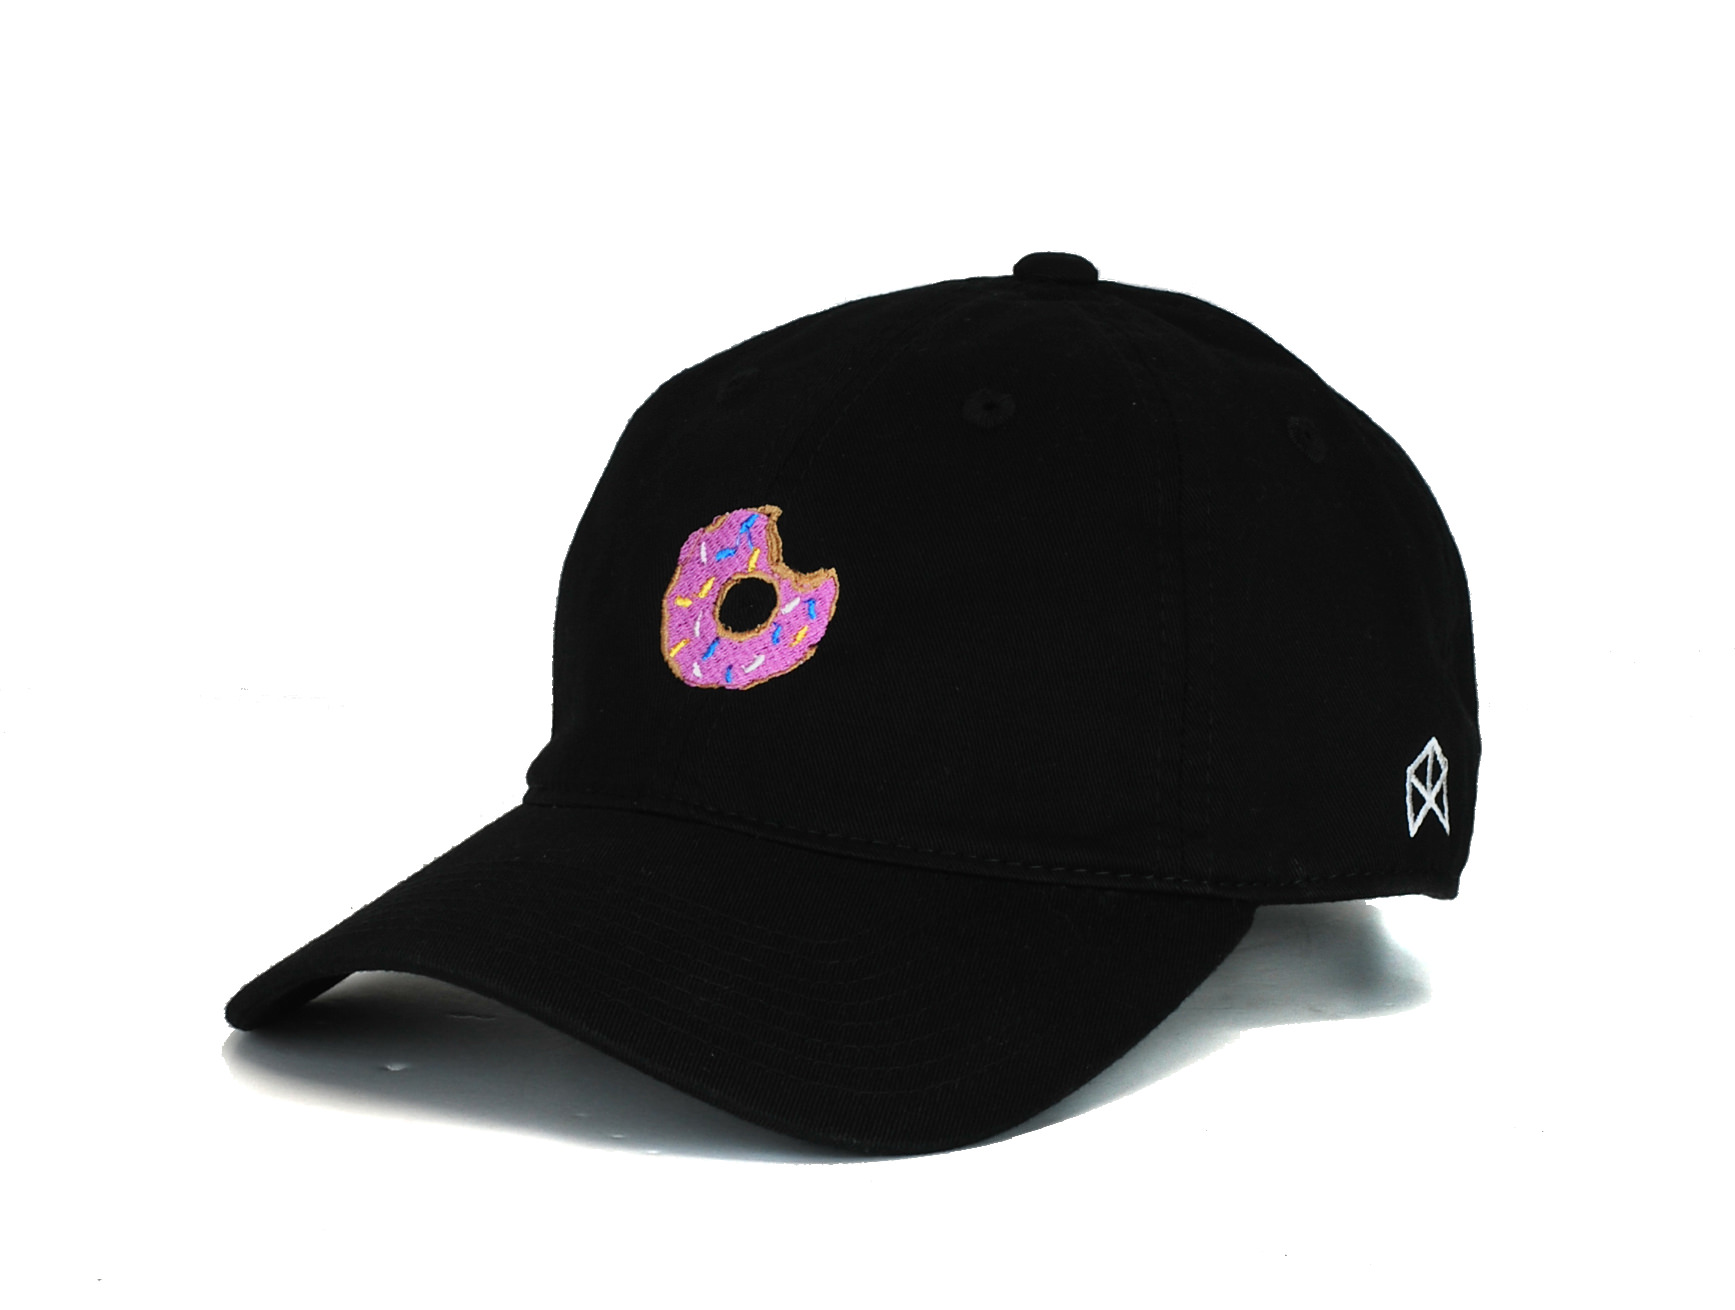 BMFIT Donut Strapback Dad Hat